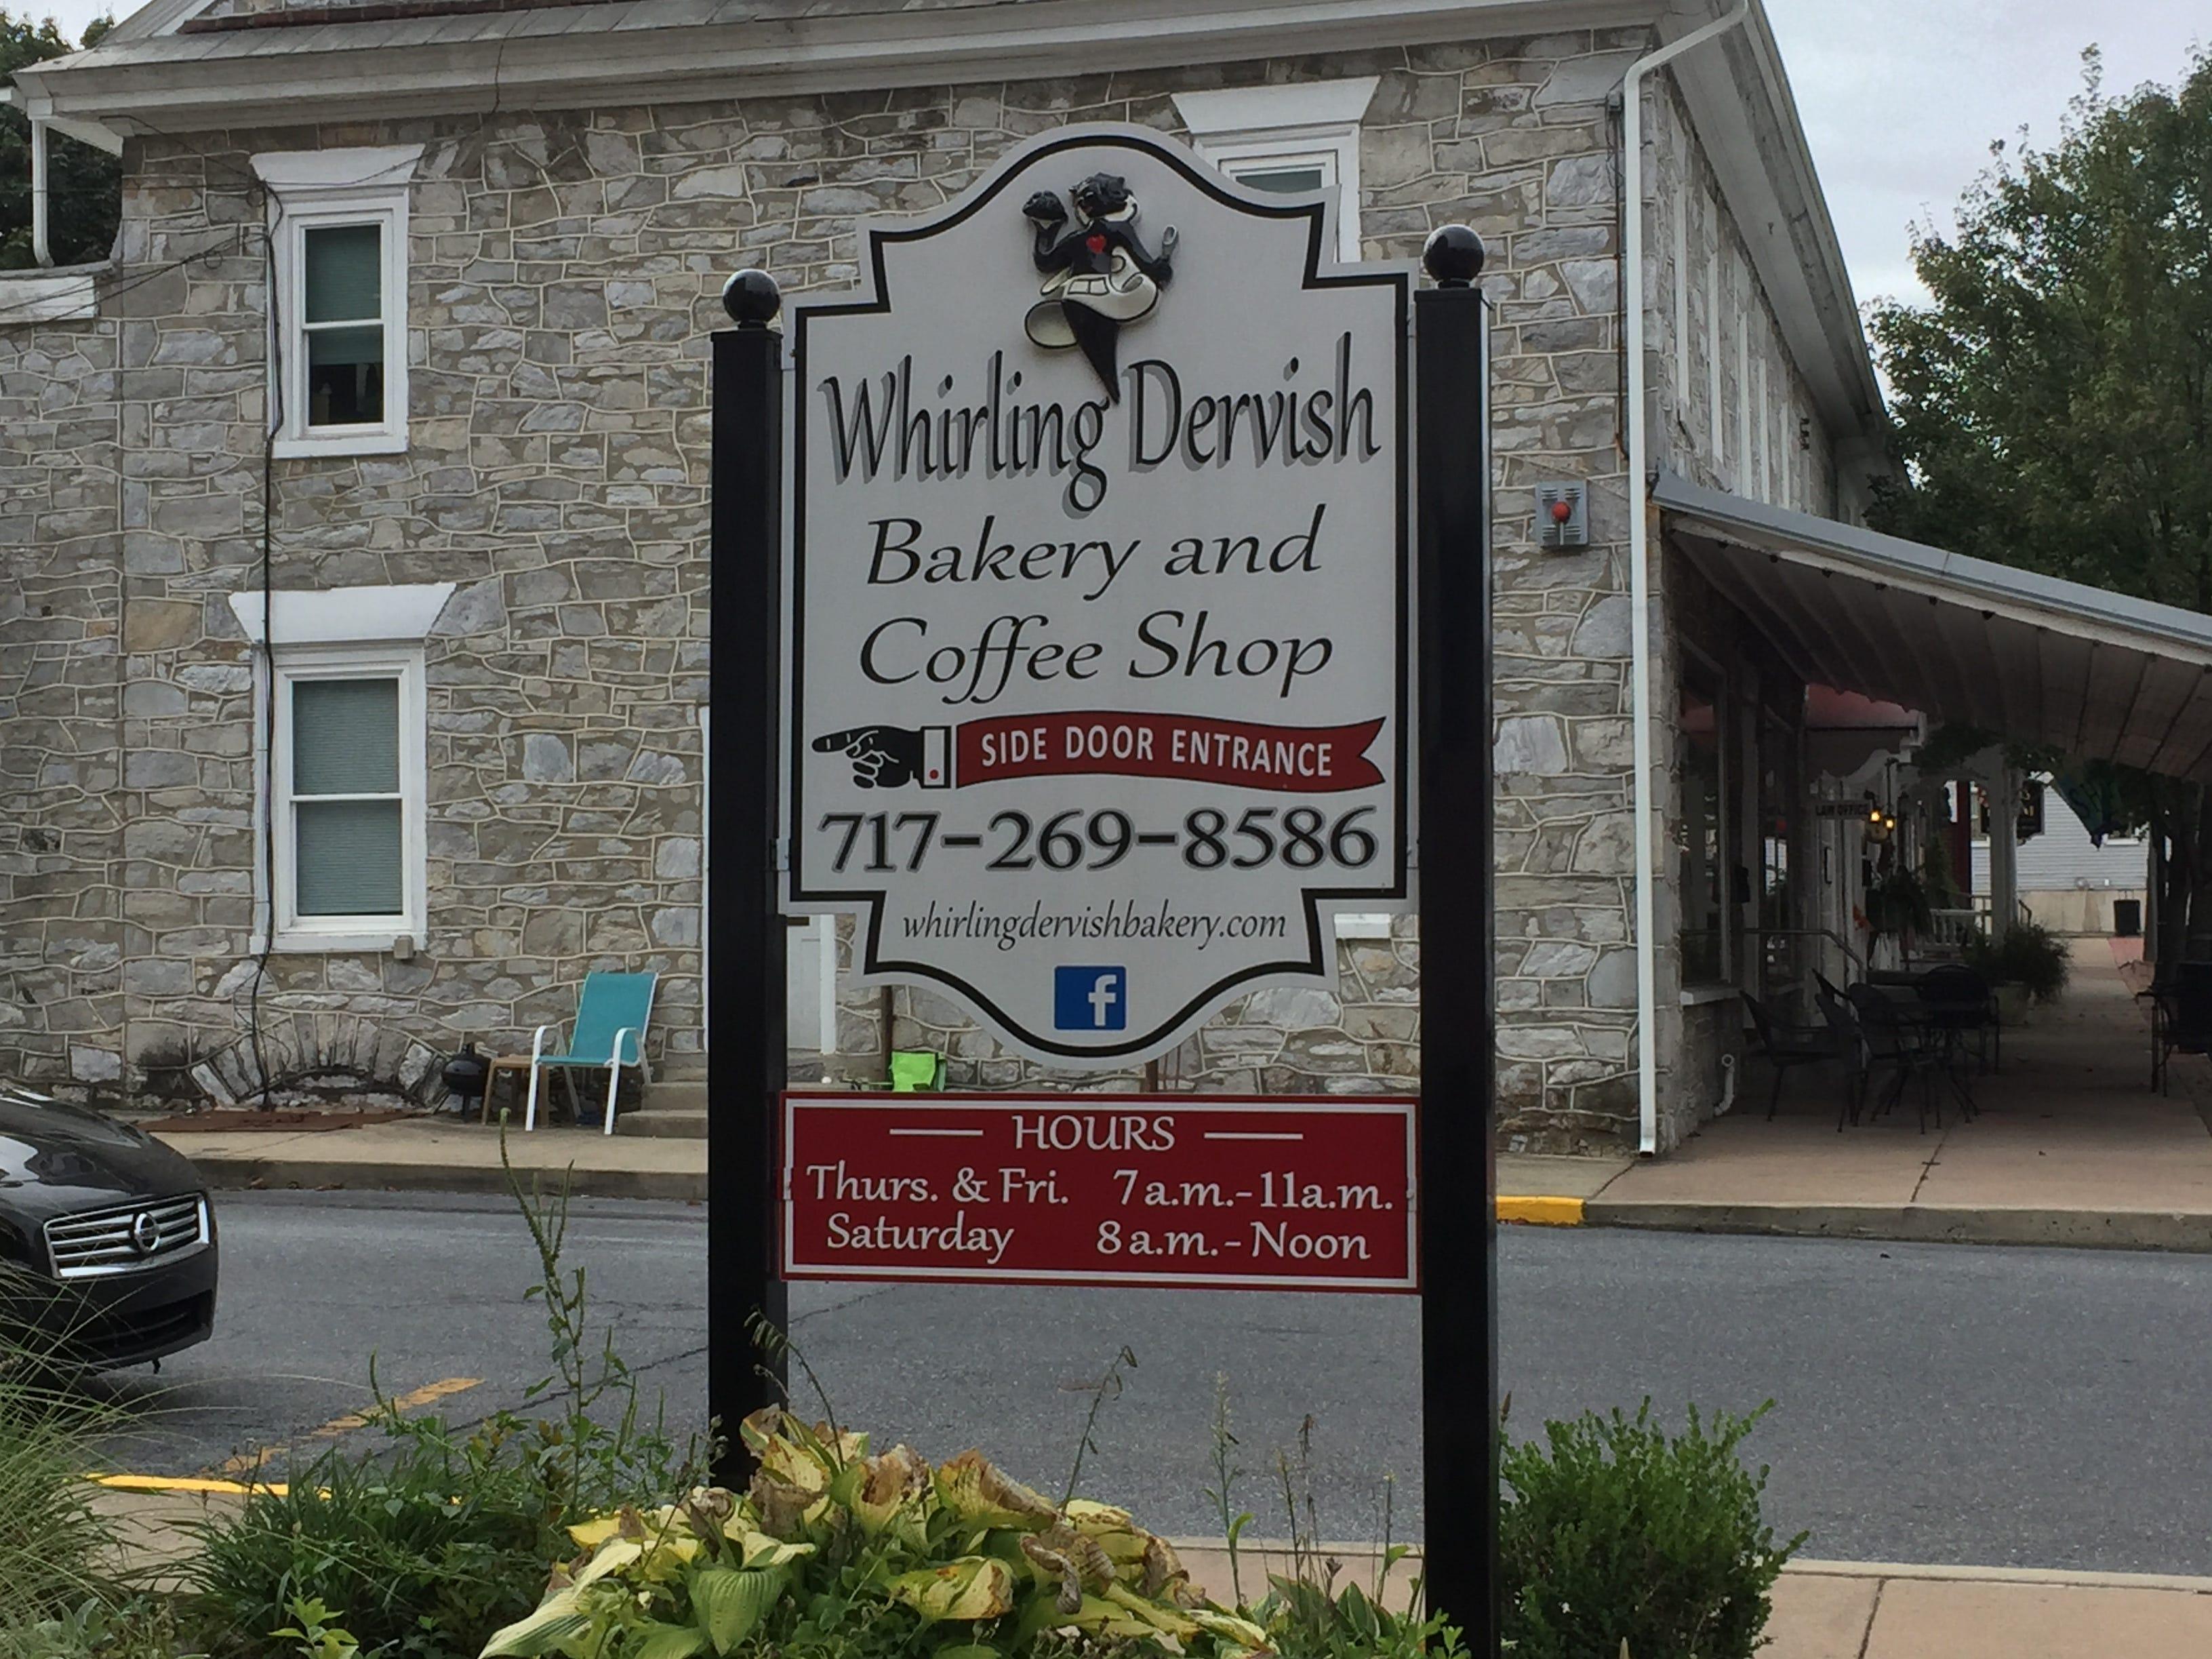 Whirling Dervish Bakery